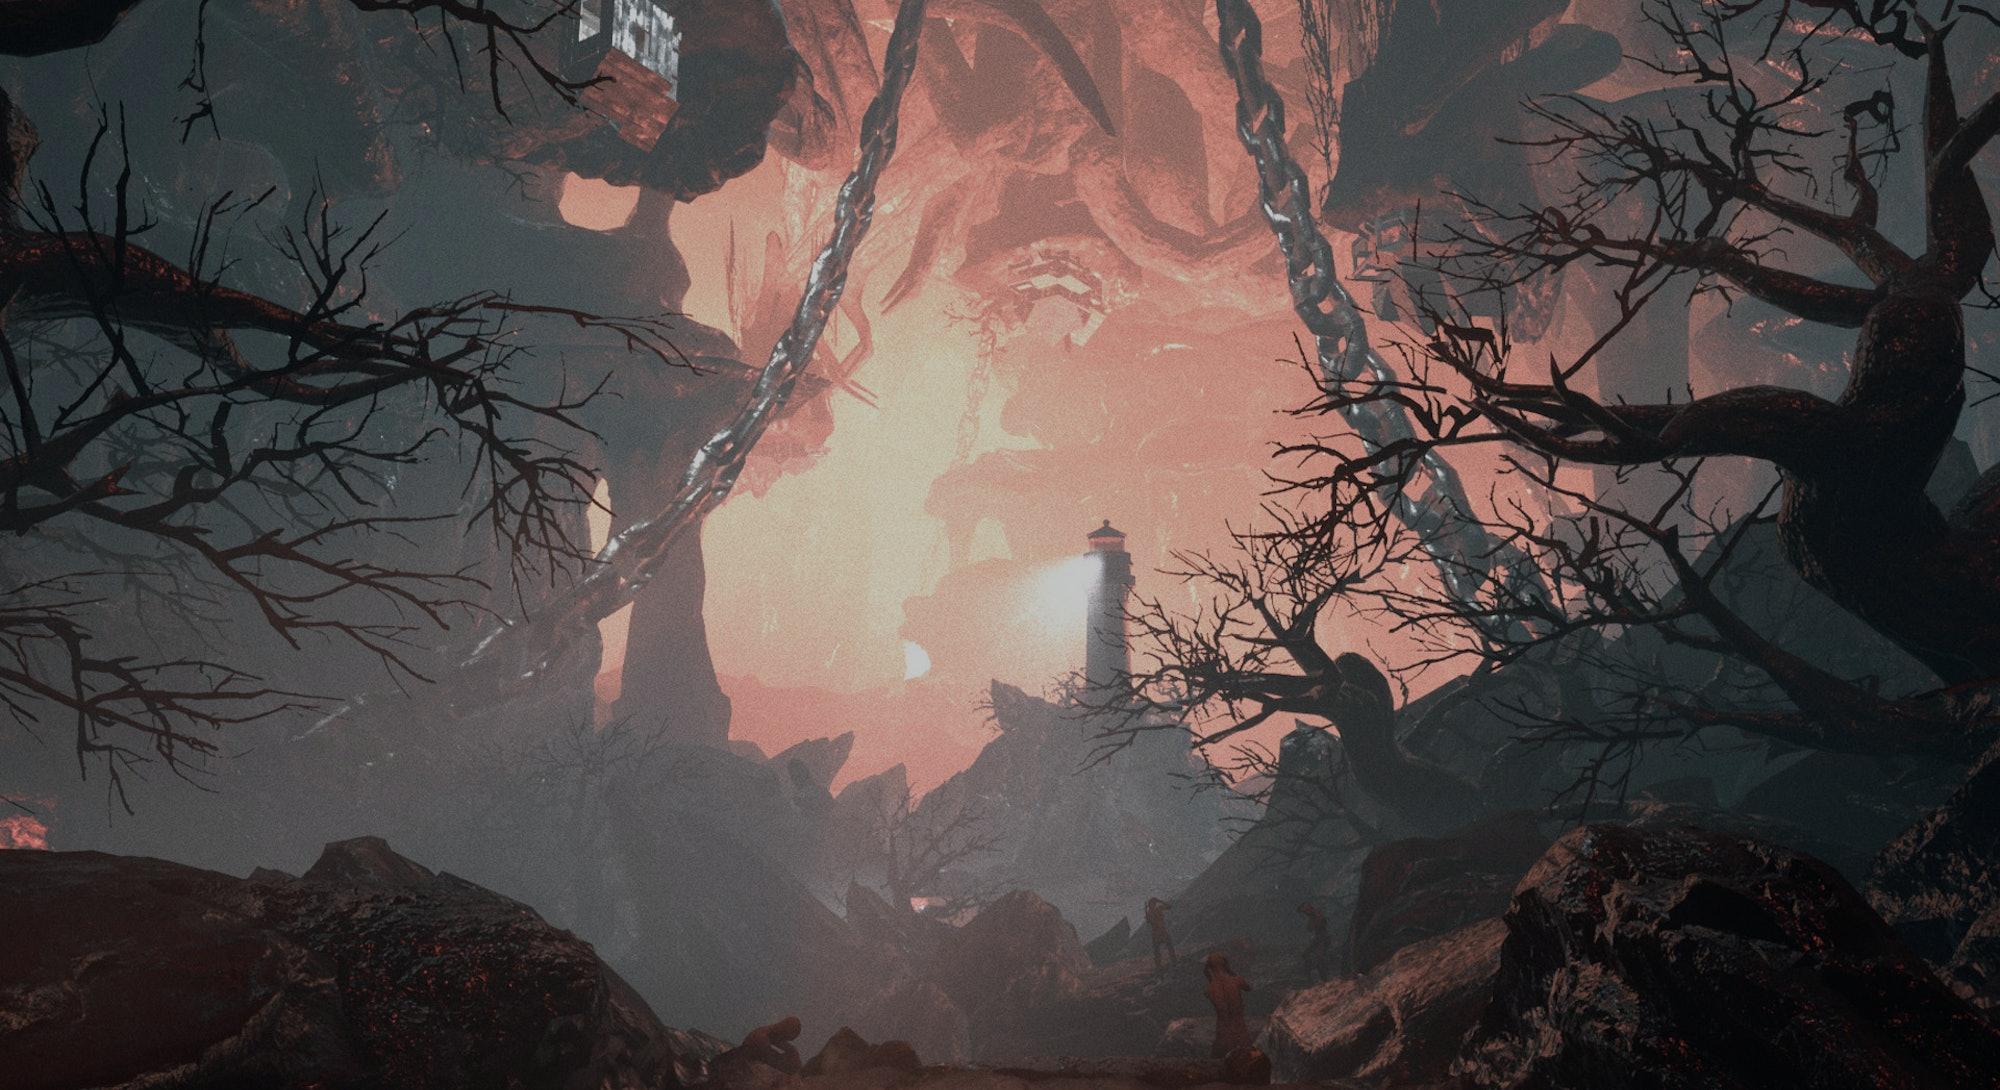 screenshot from Visage horror video game